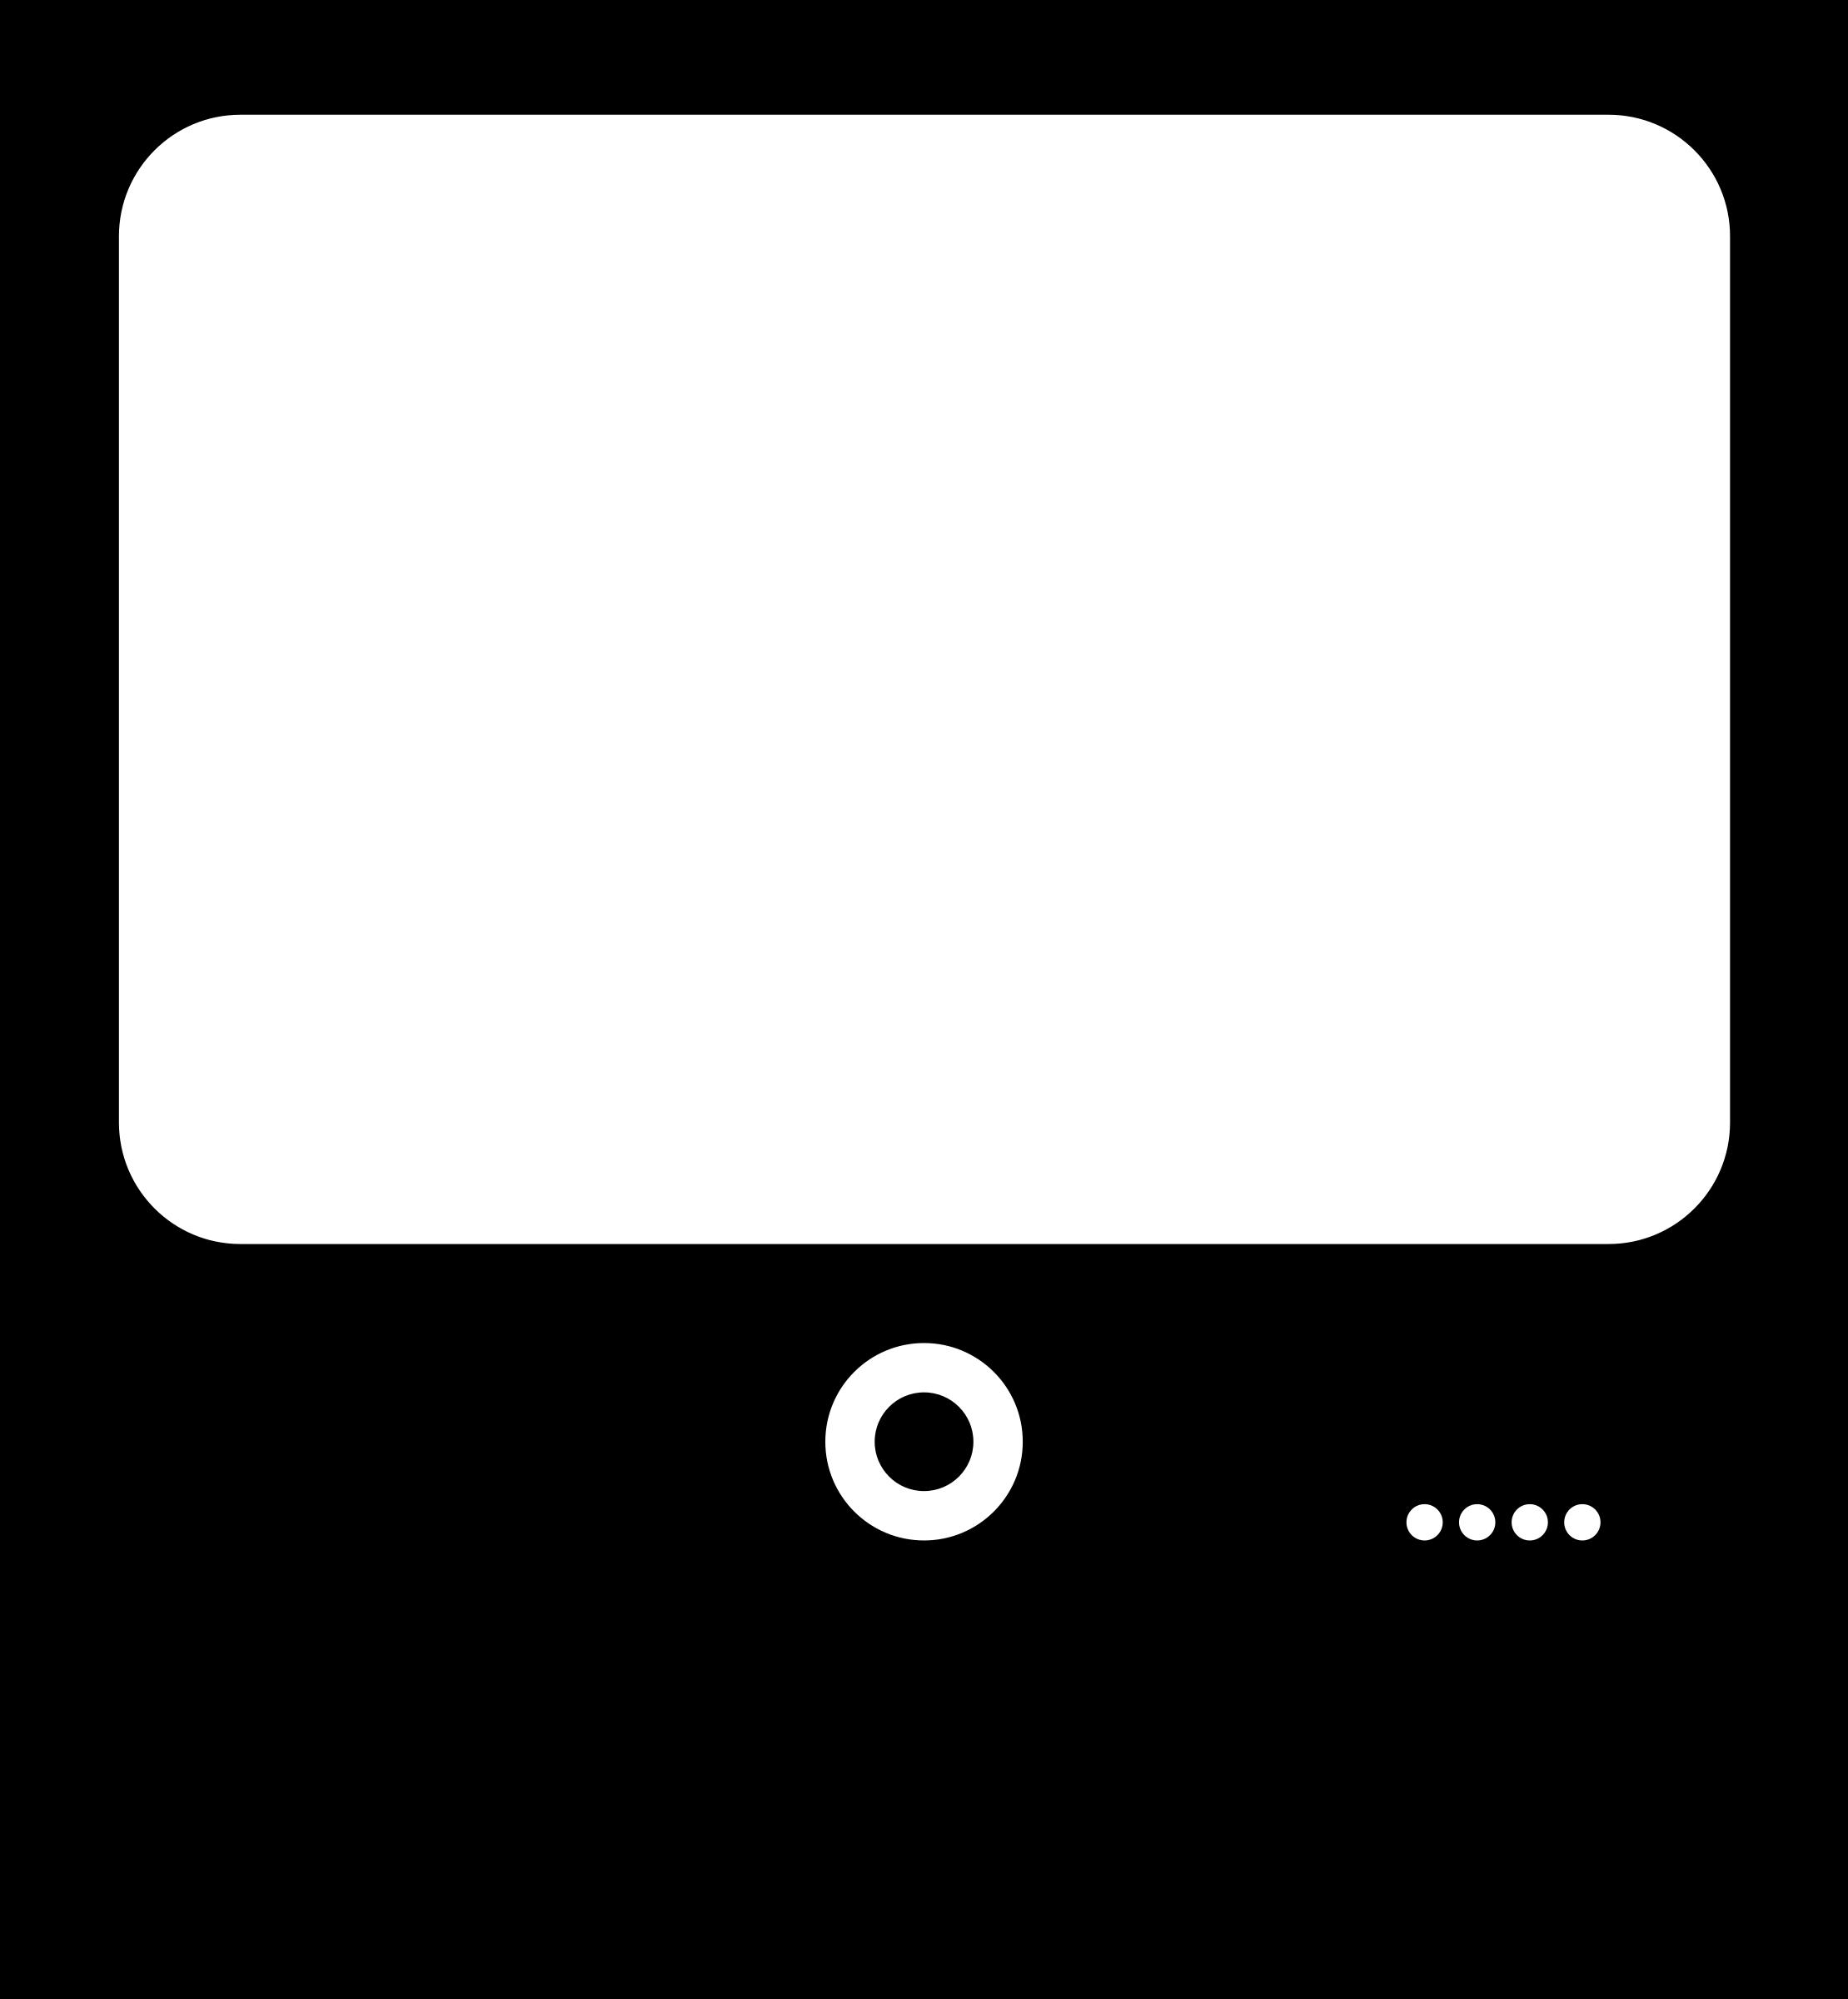 Computer Monitor Clipart Clipart - computer monitor